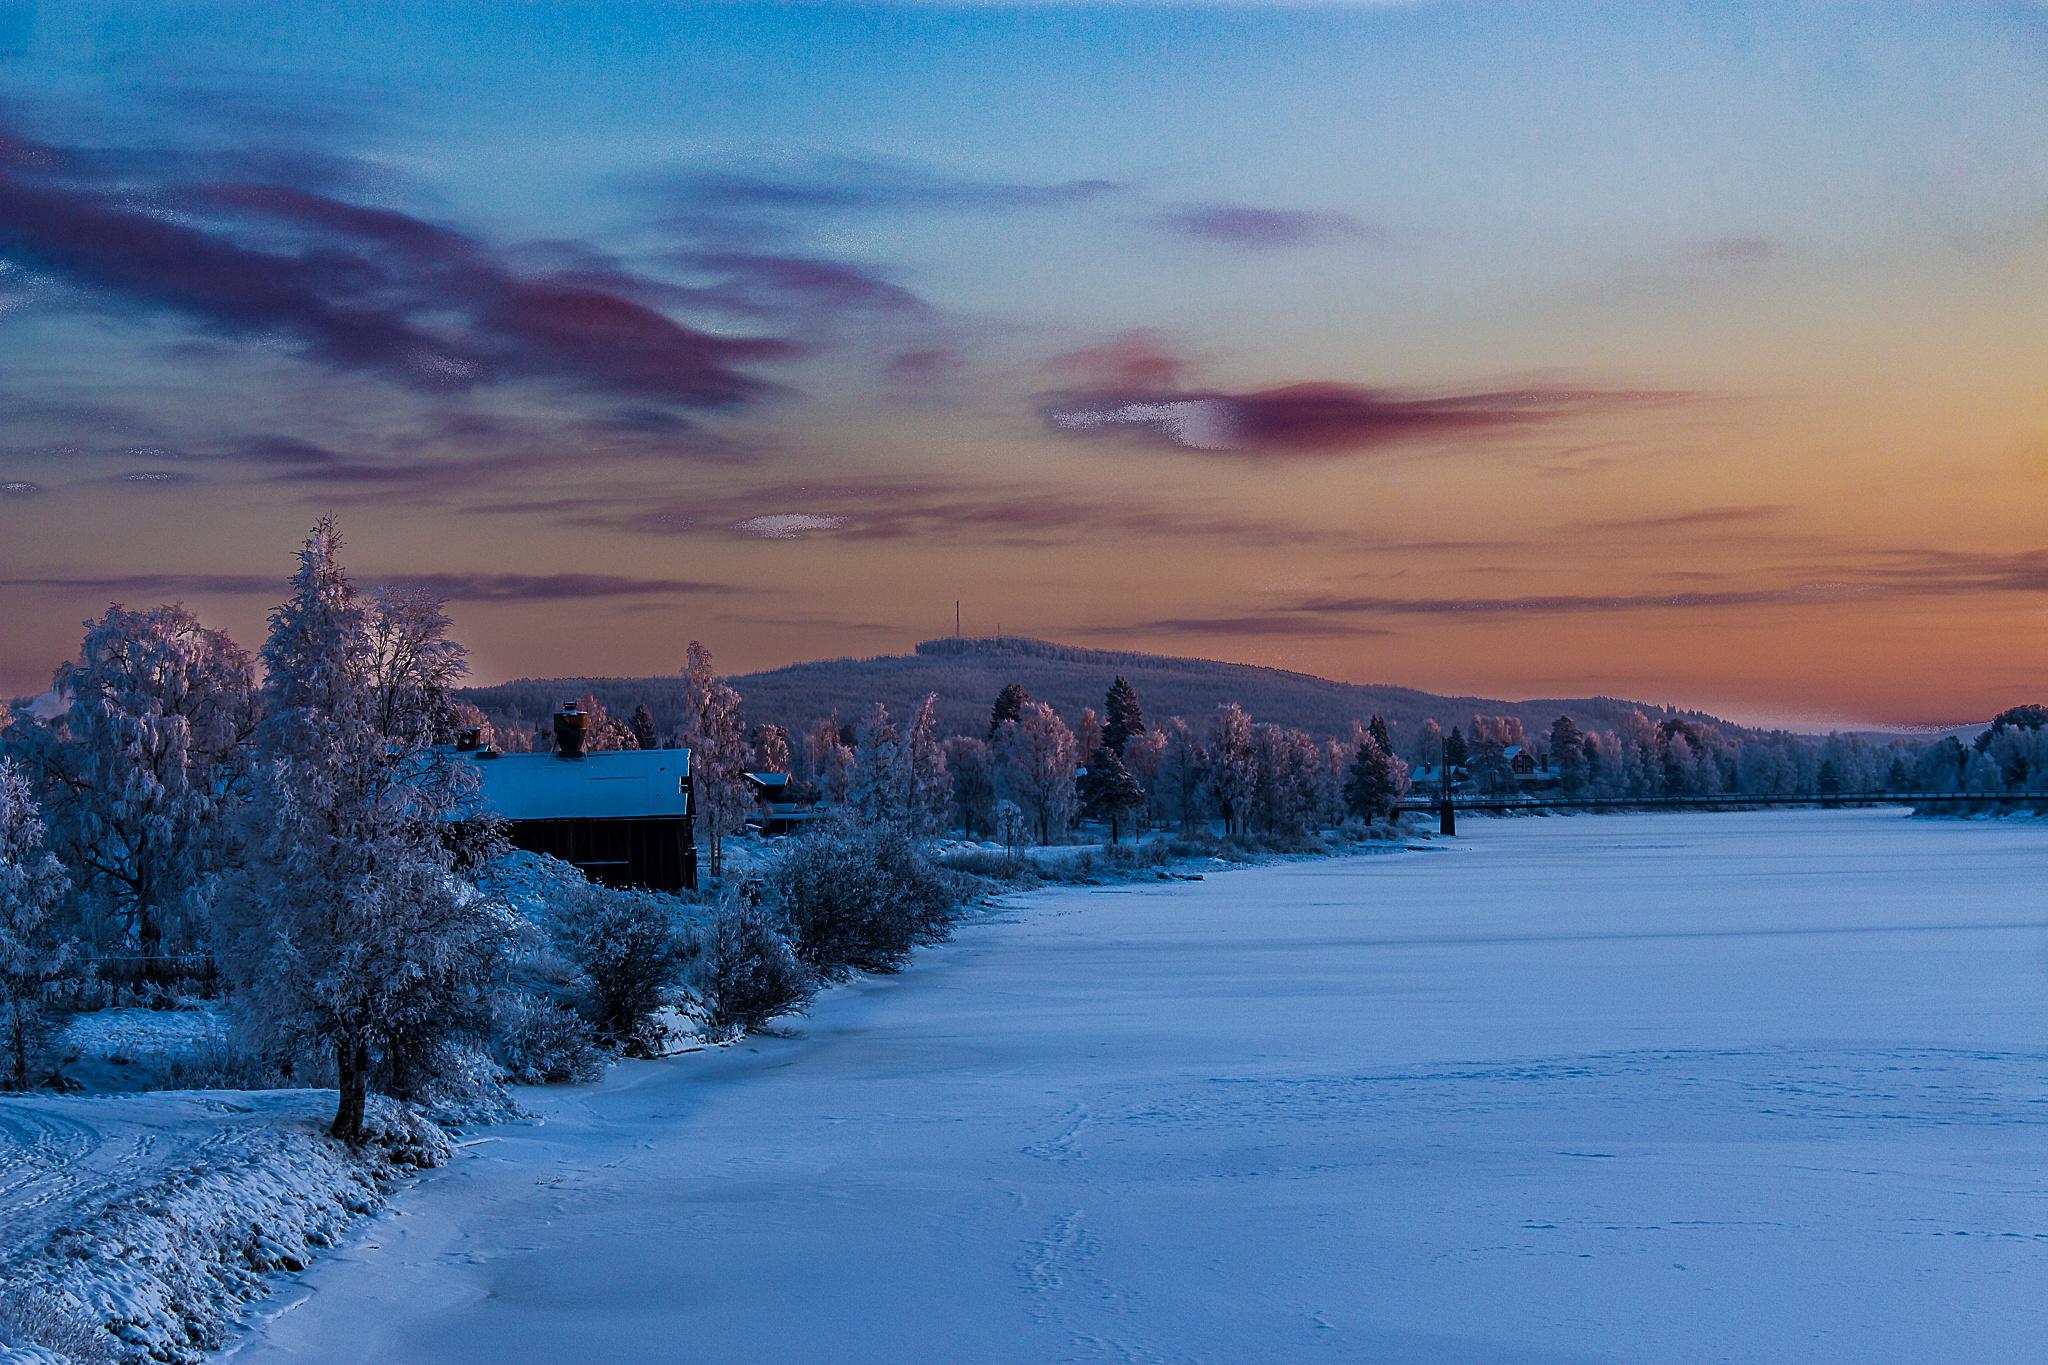 Winter wonderland by Carl Hult